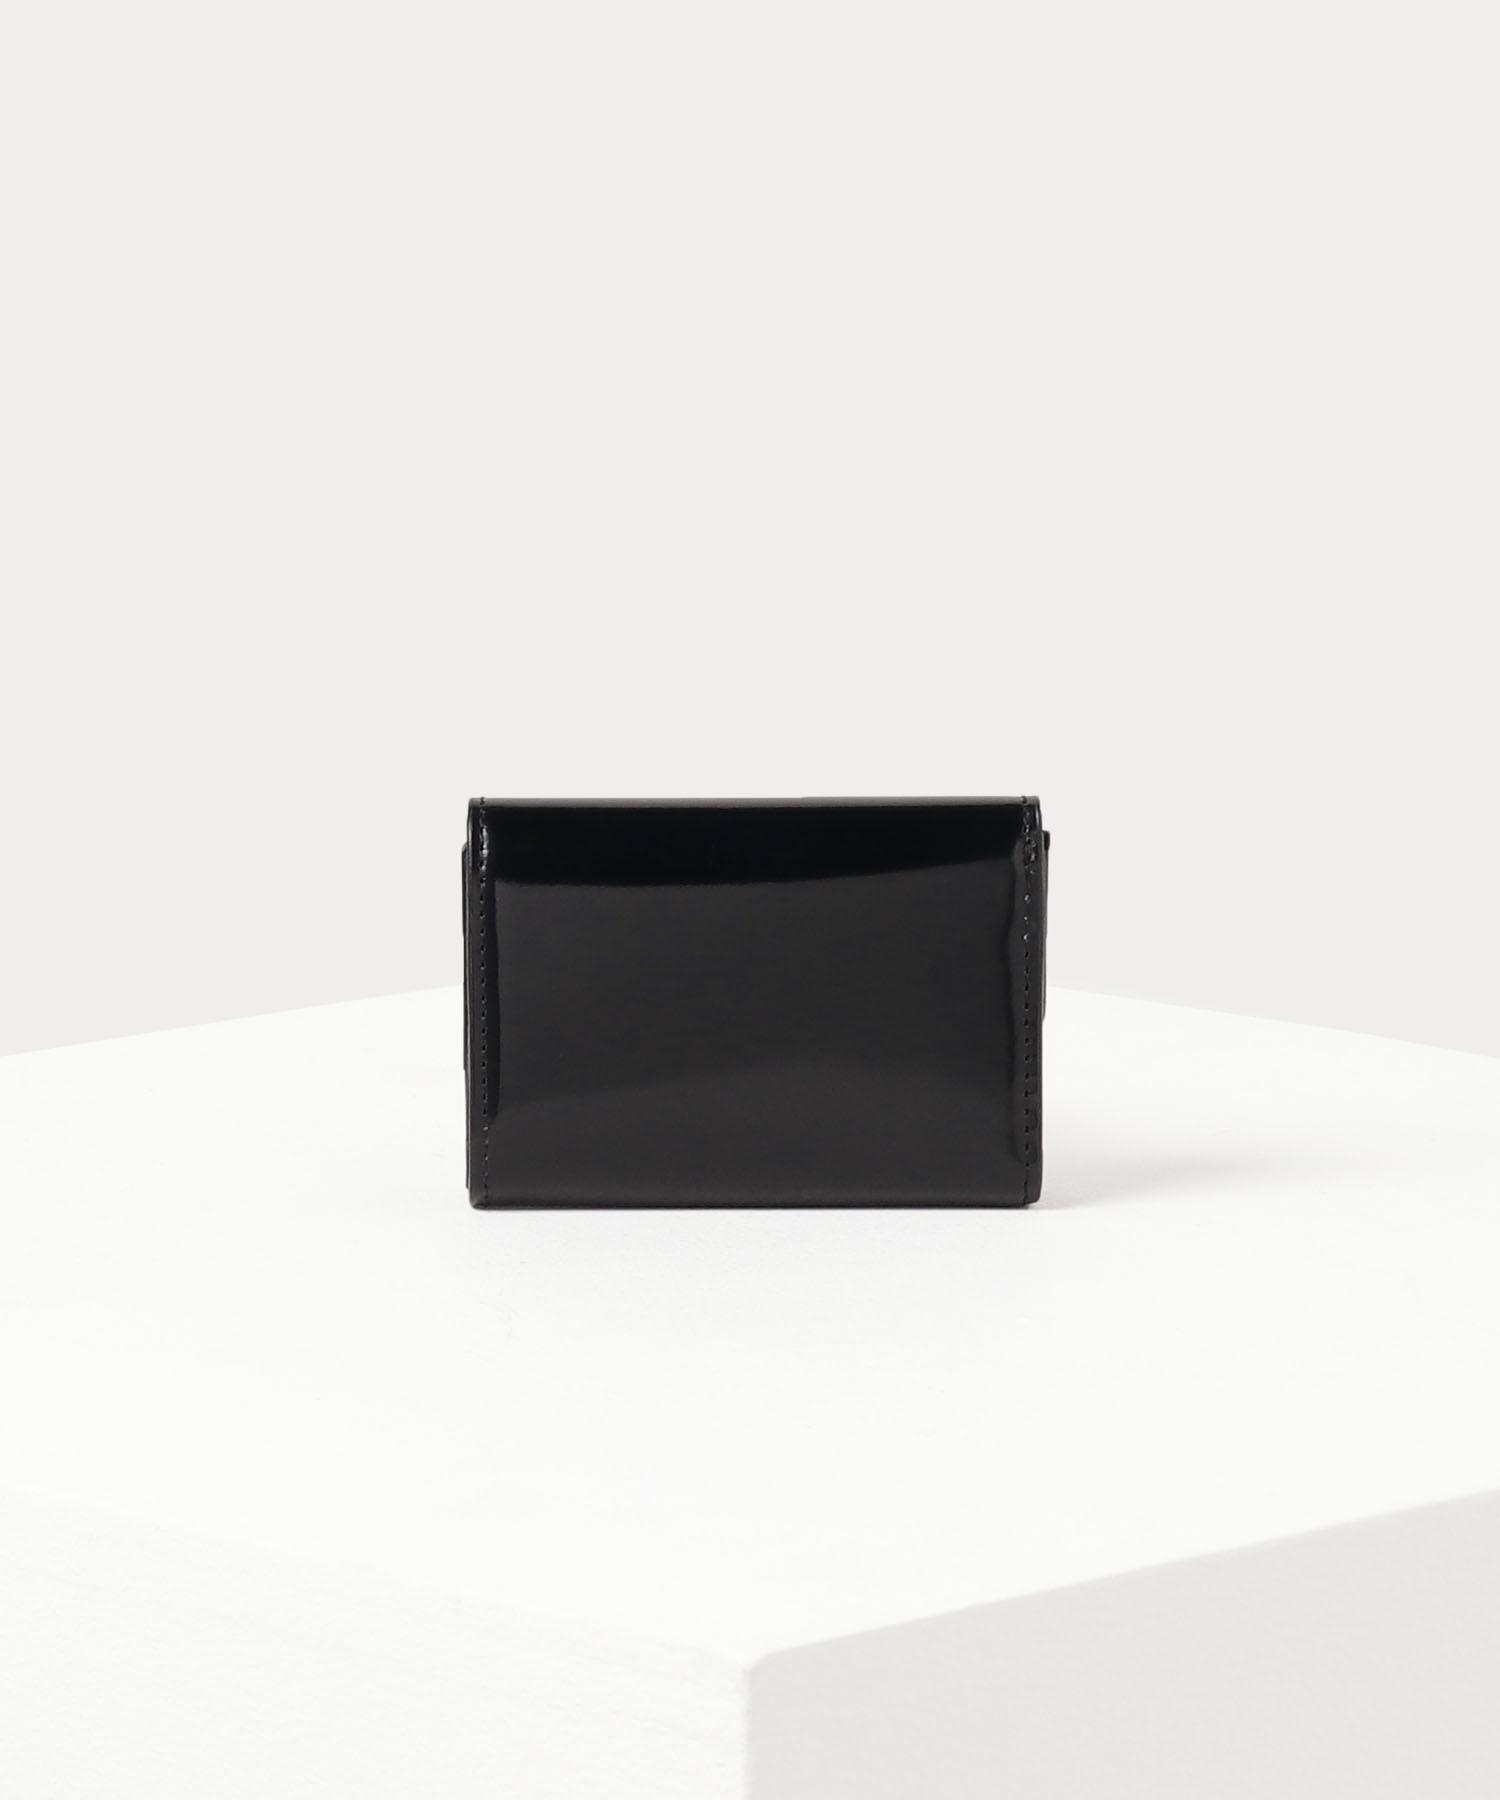 ADVAN 三つ折り財布